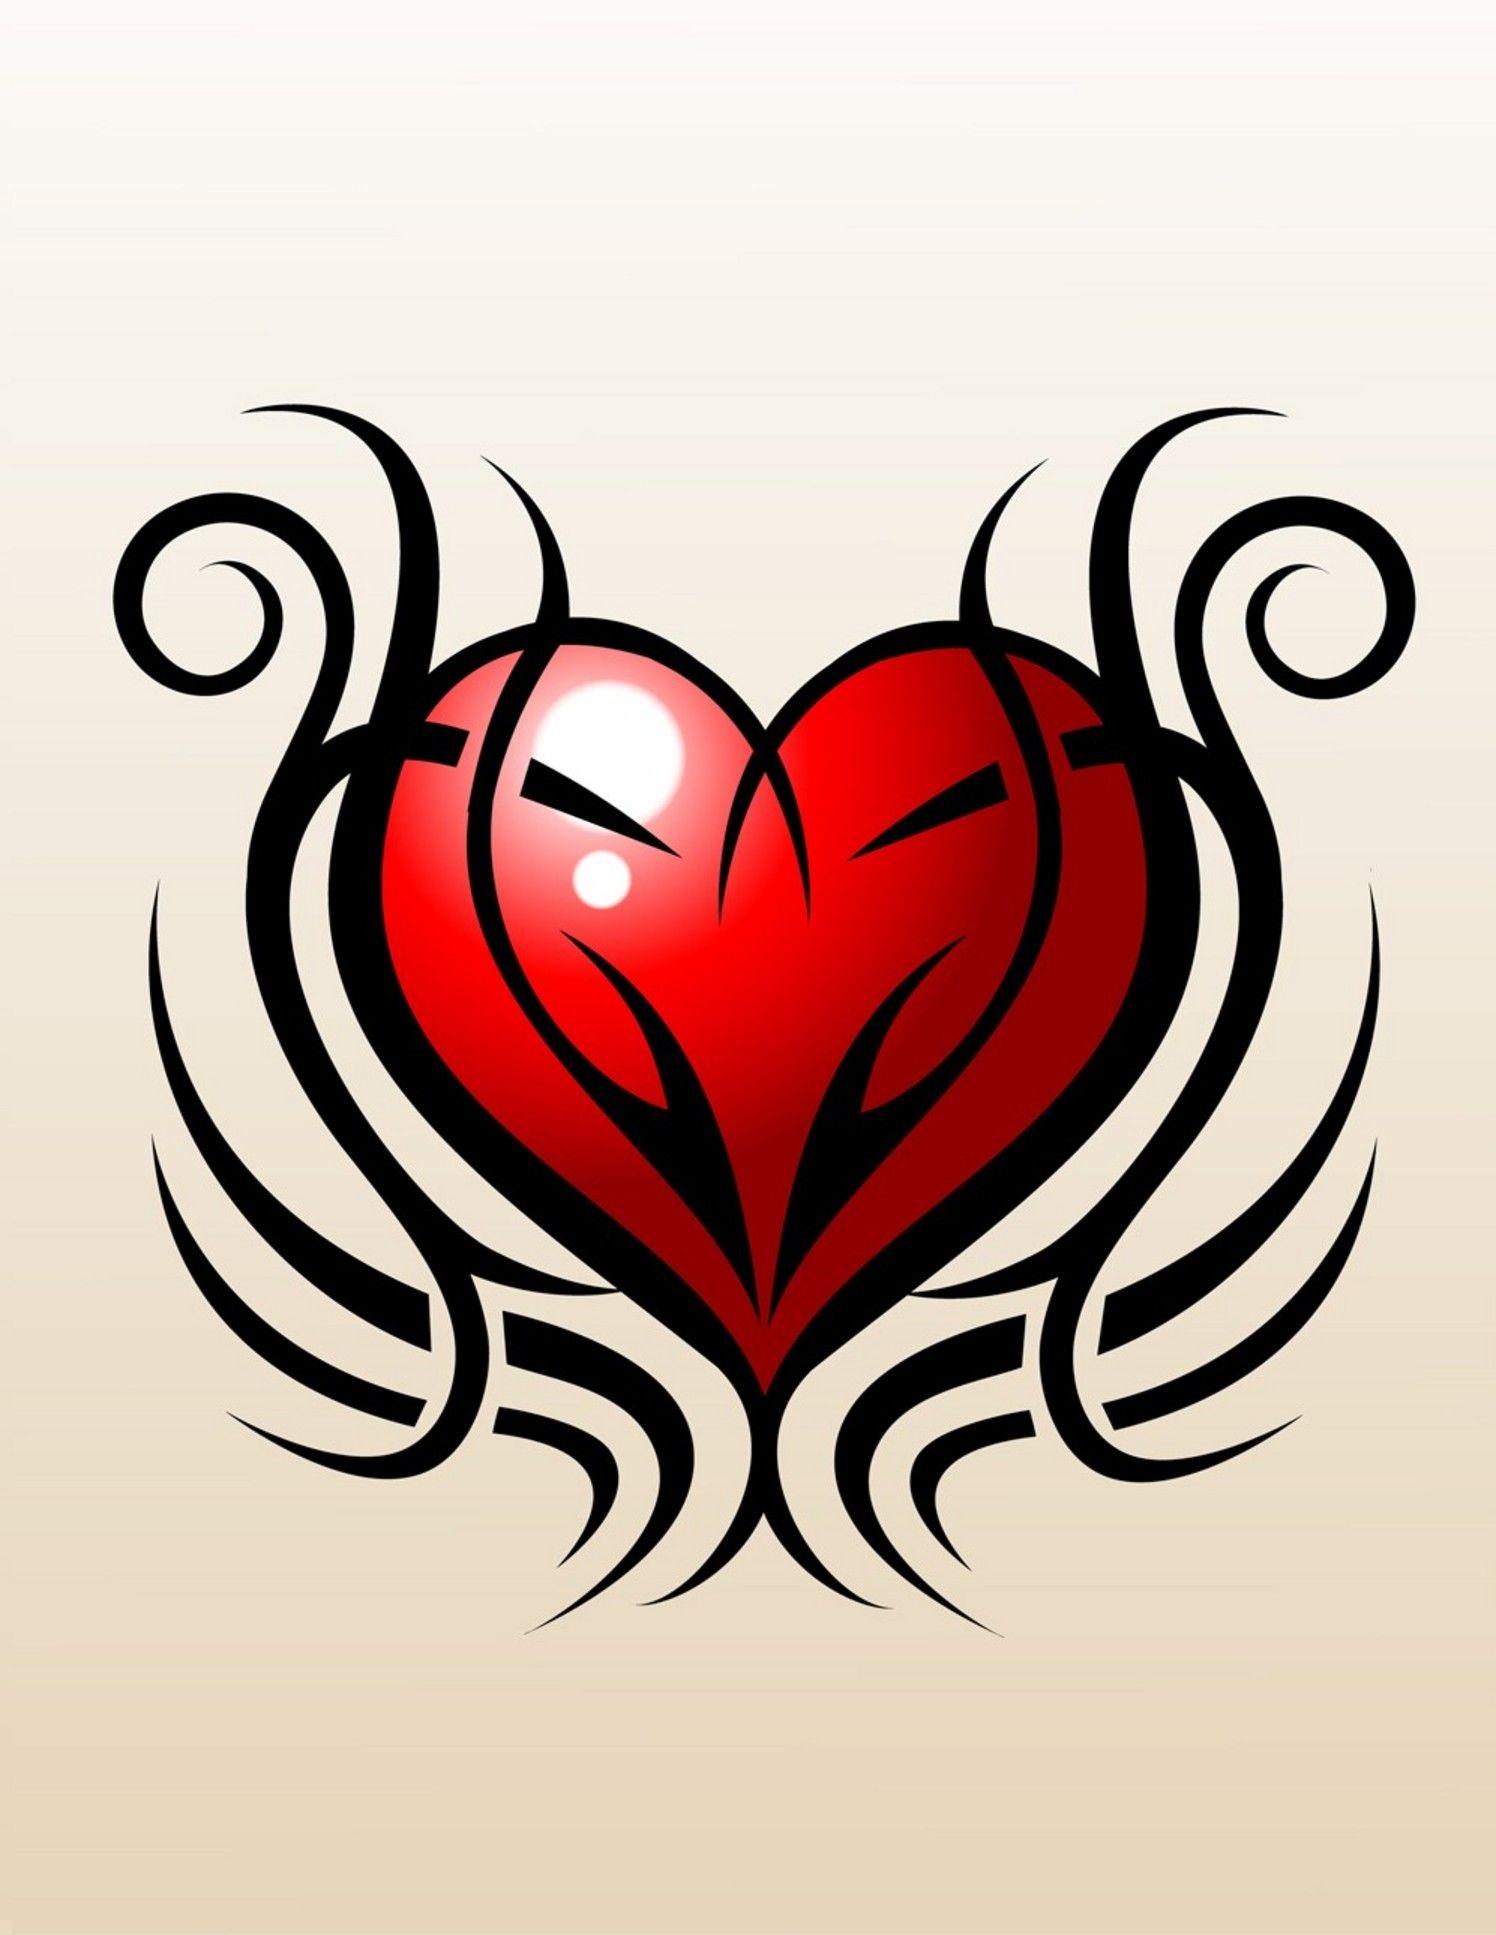 Pin by melissa nye on heart tattoos pinterest tattoo and tatoos tatting buycottarizona Gallery